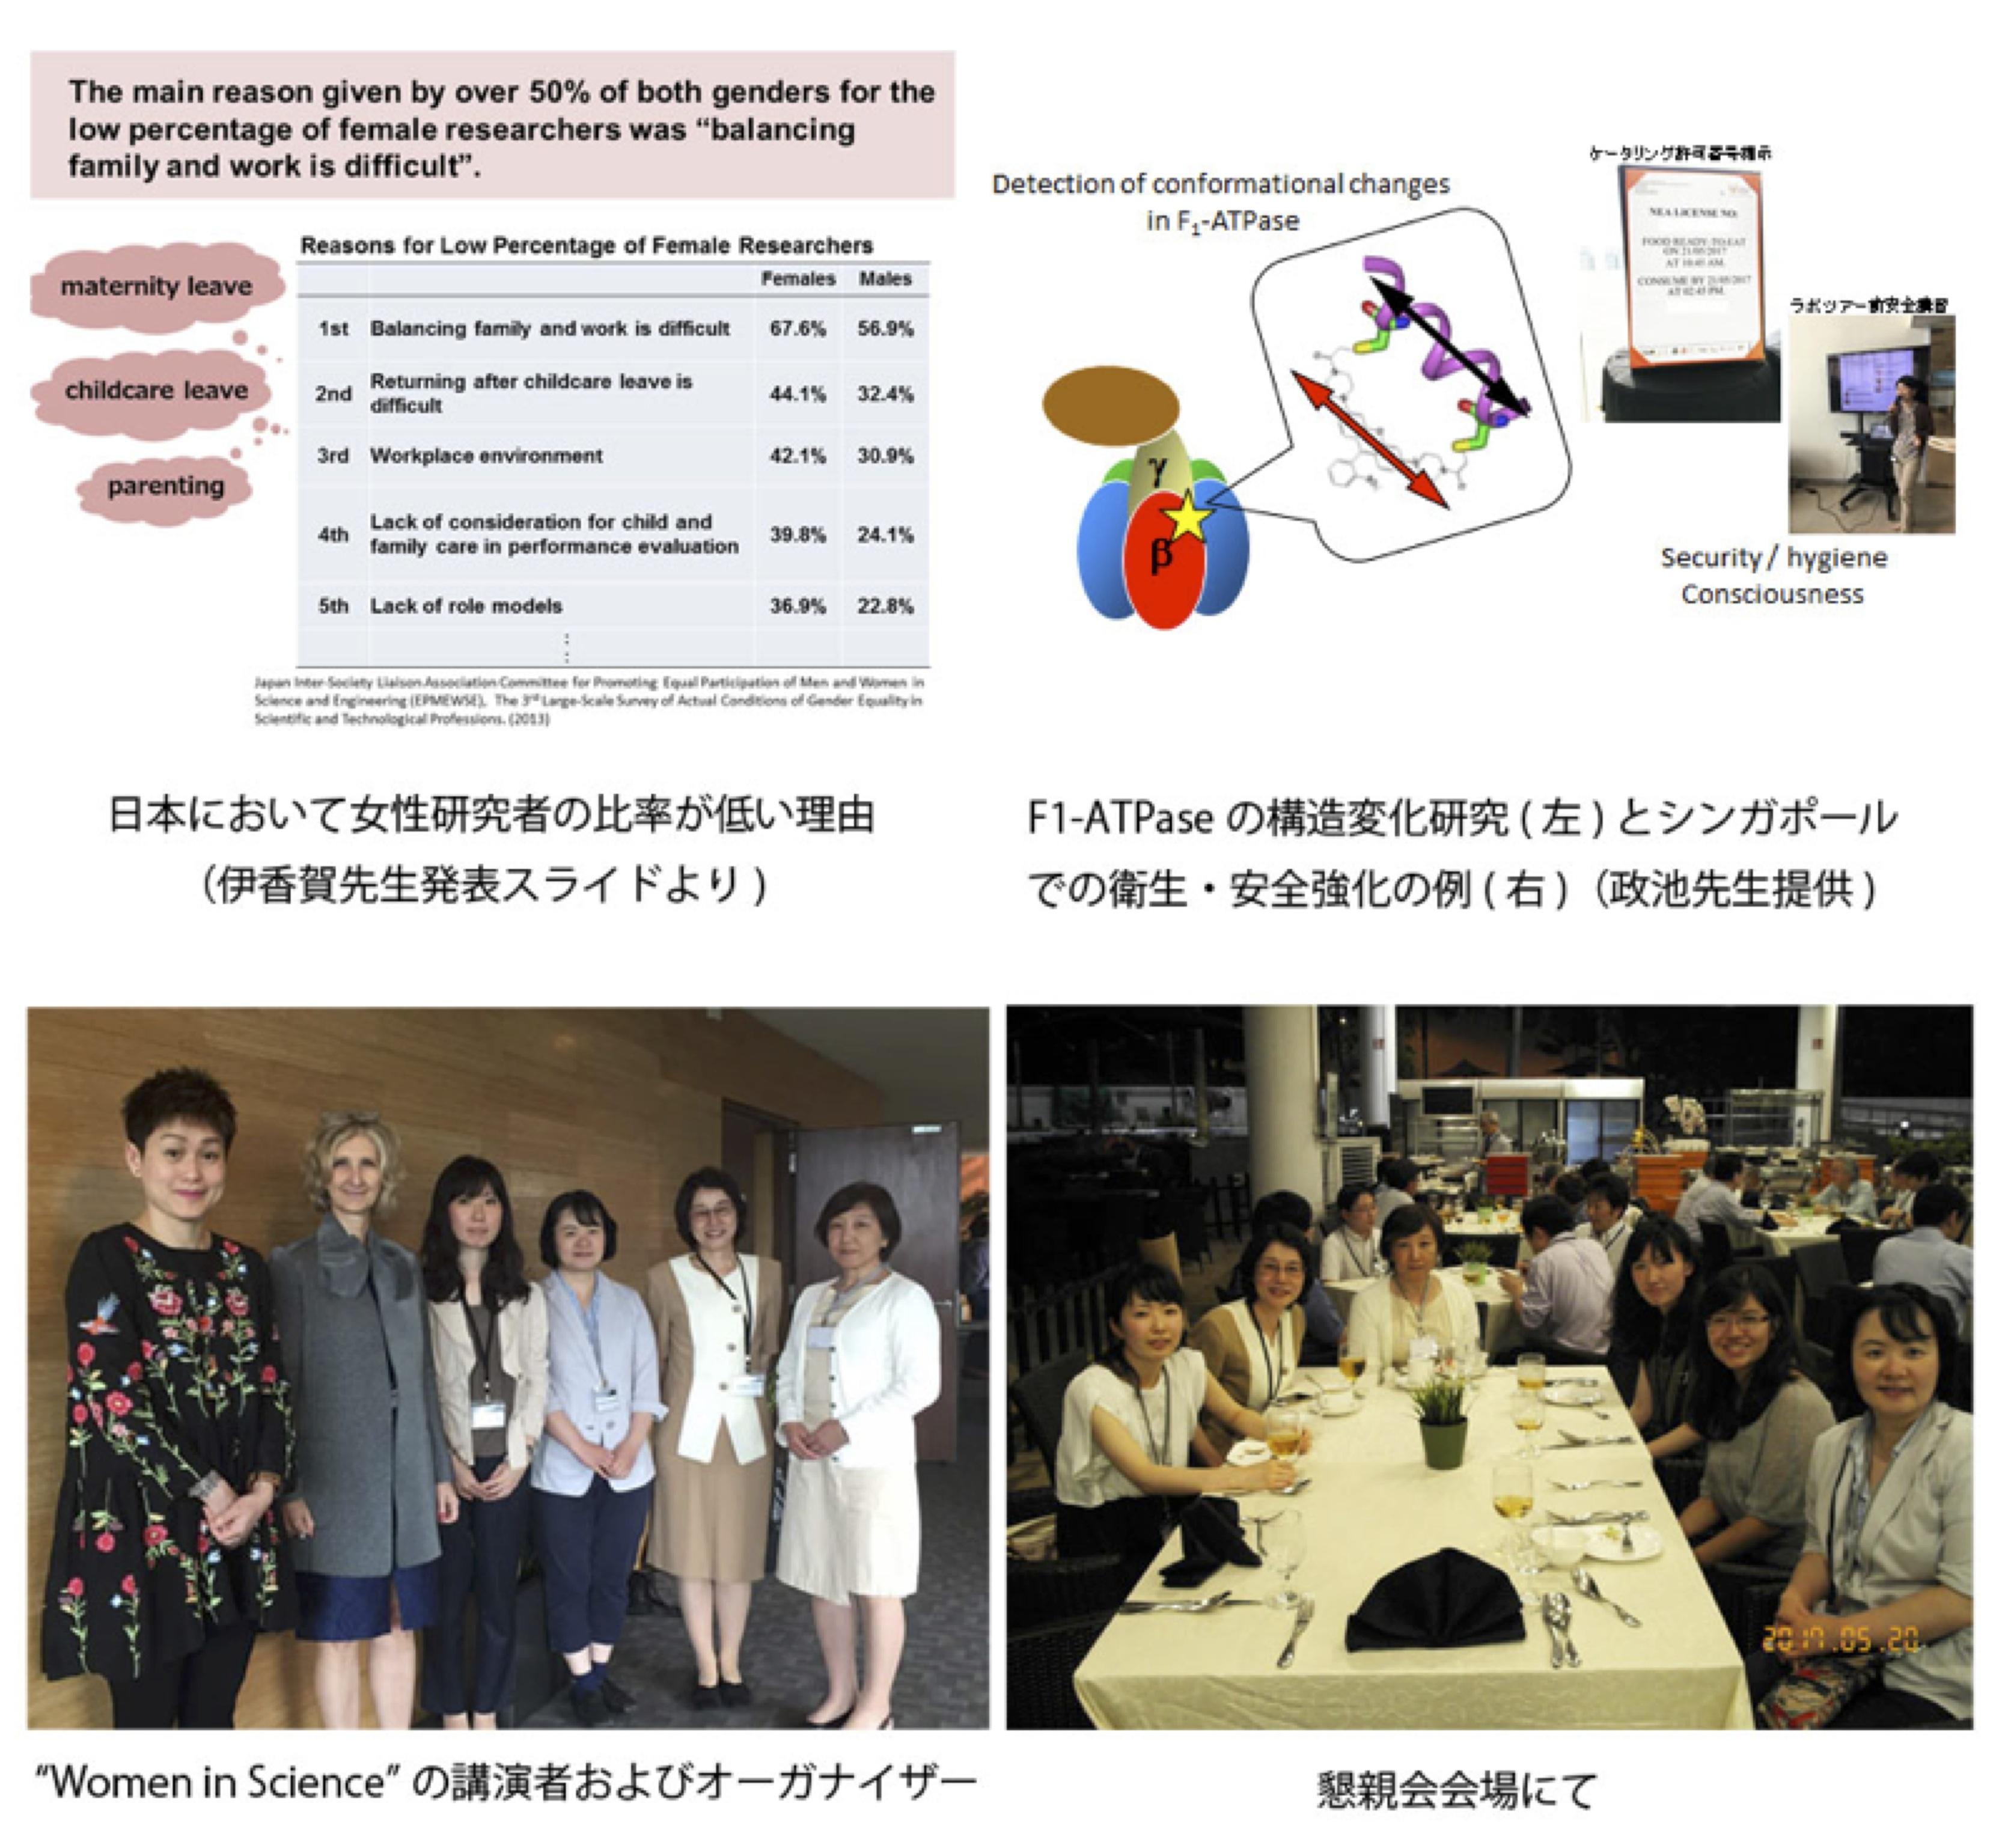 women in science を企画 実現して 日本バイオイメージング学会公式